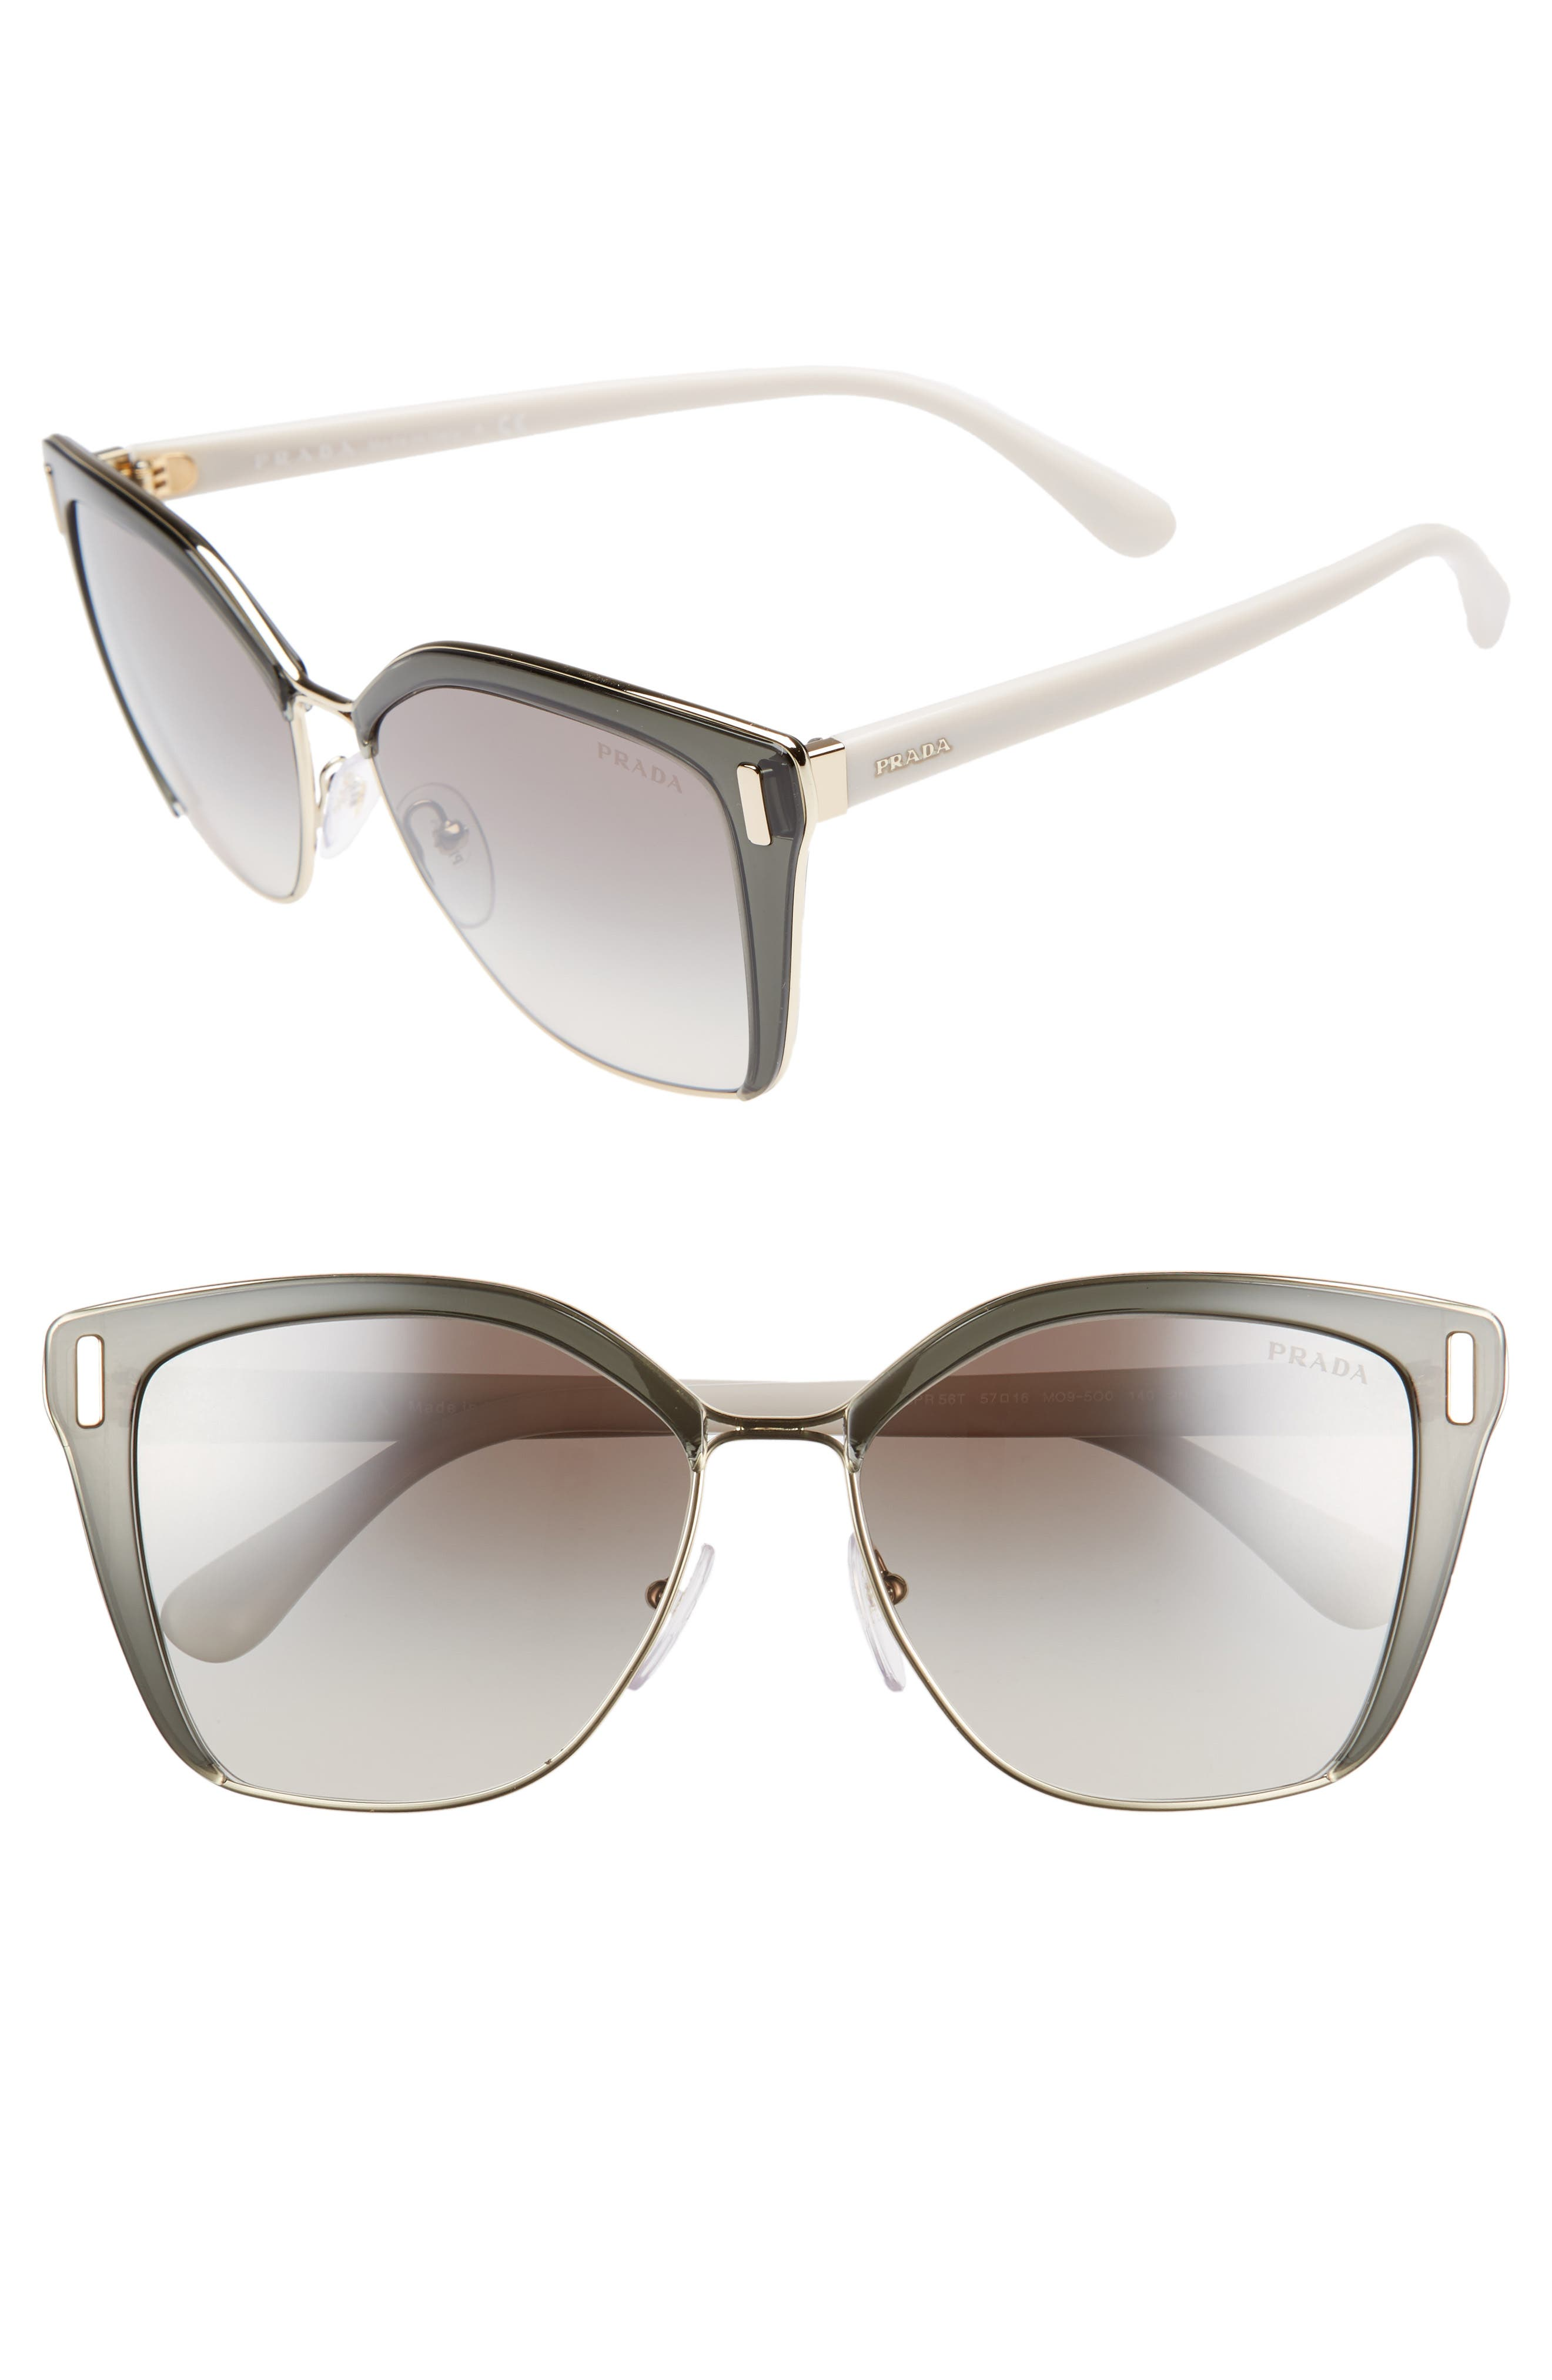 54mm Gradient Geometric Sunglasses,                         Main,                         color, GREY/ GOLD GRADIENT MIRROR